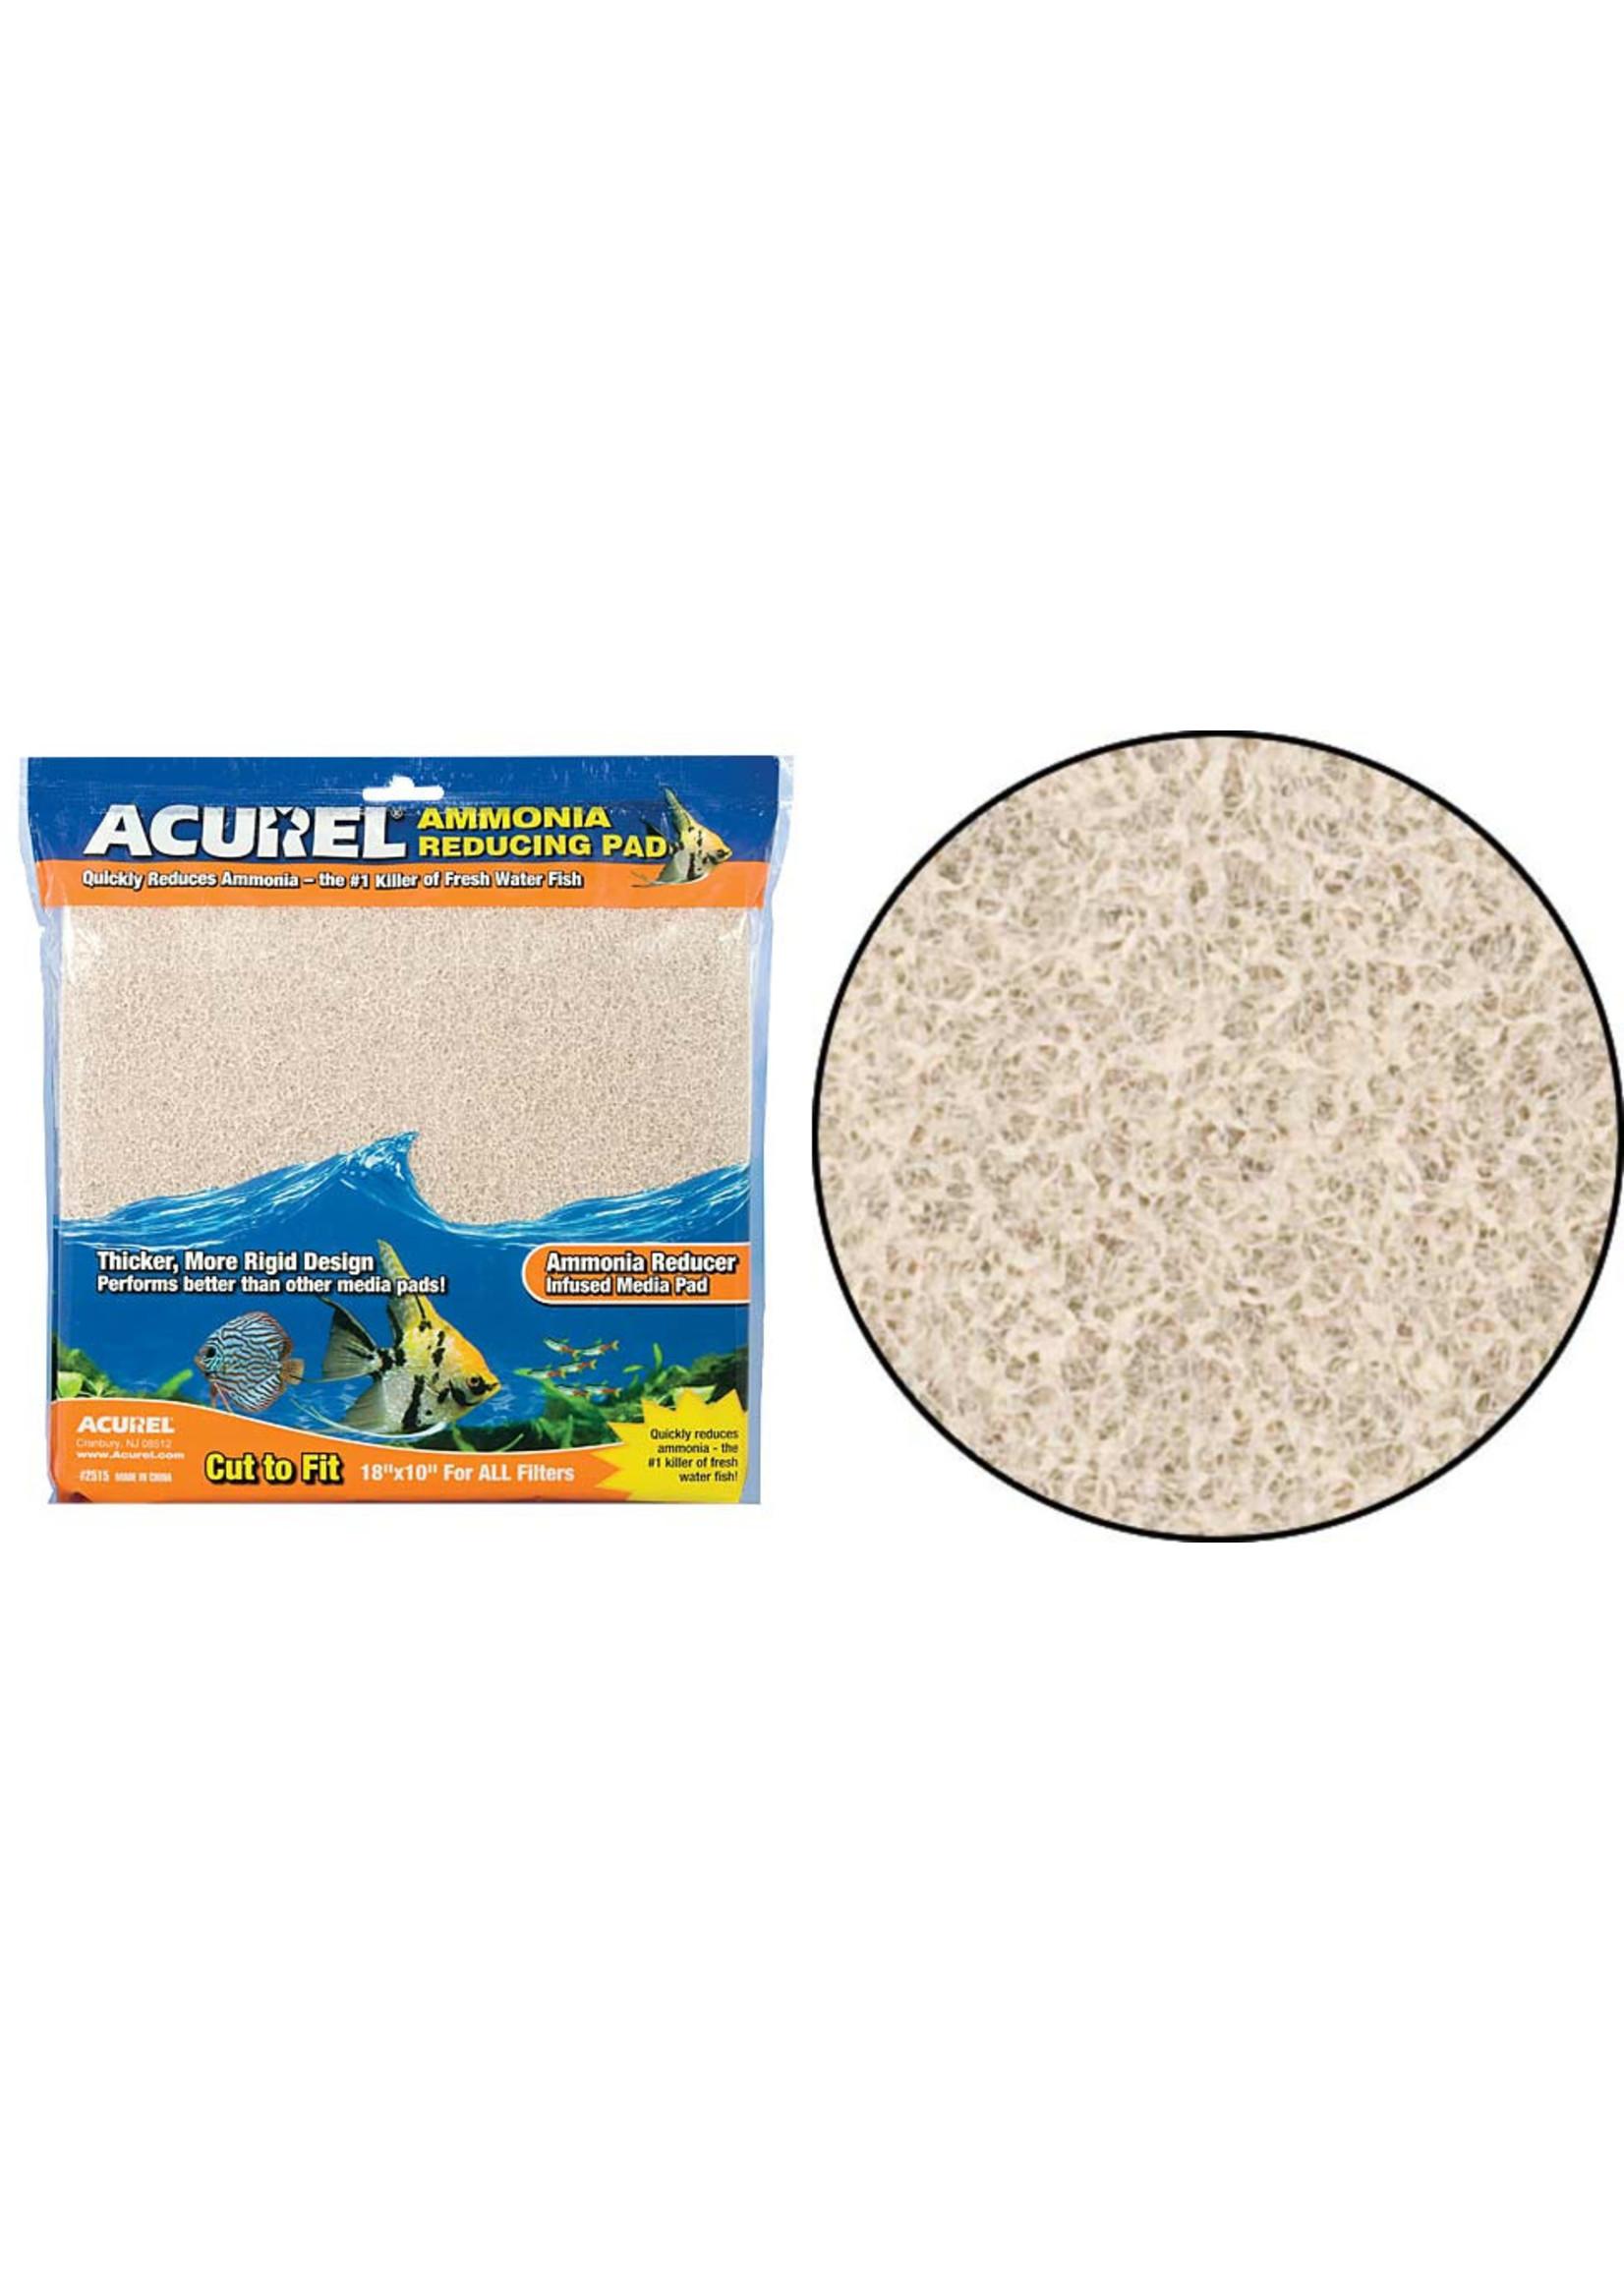 Acurel Acurel Cut to Fit Ammonia Reducing Media Pad 10x18